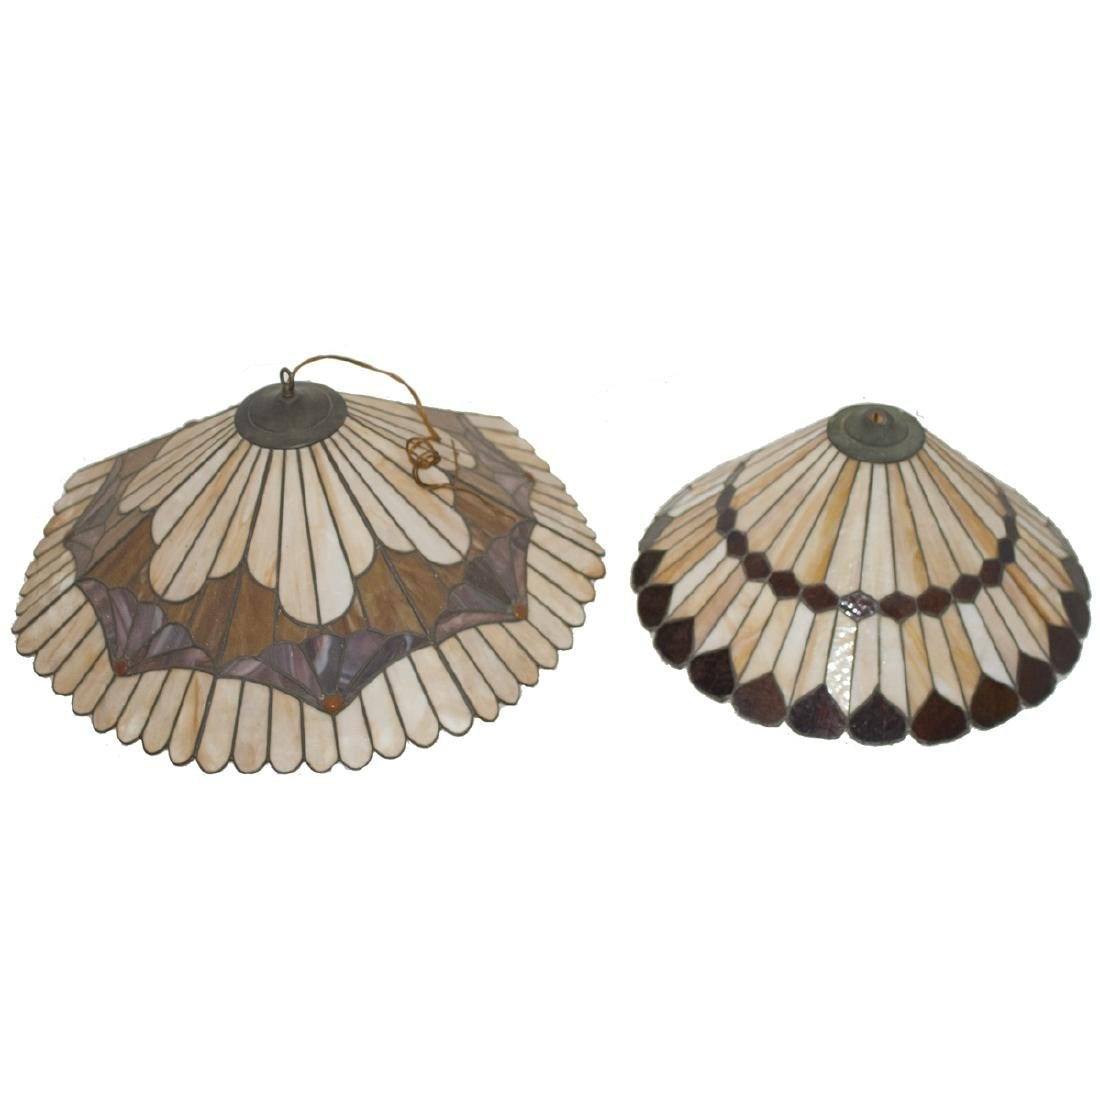 Tiffany Style Slag Glass Lamp Shades